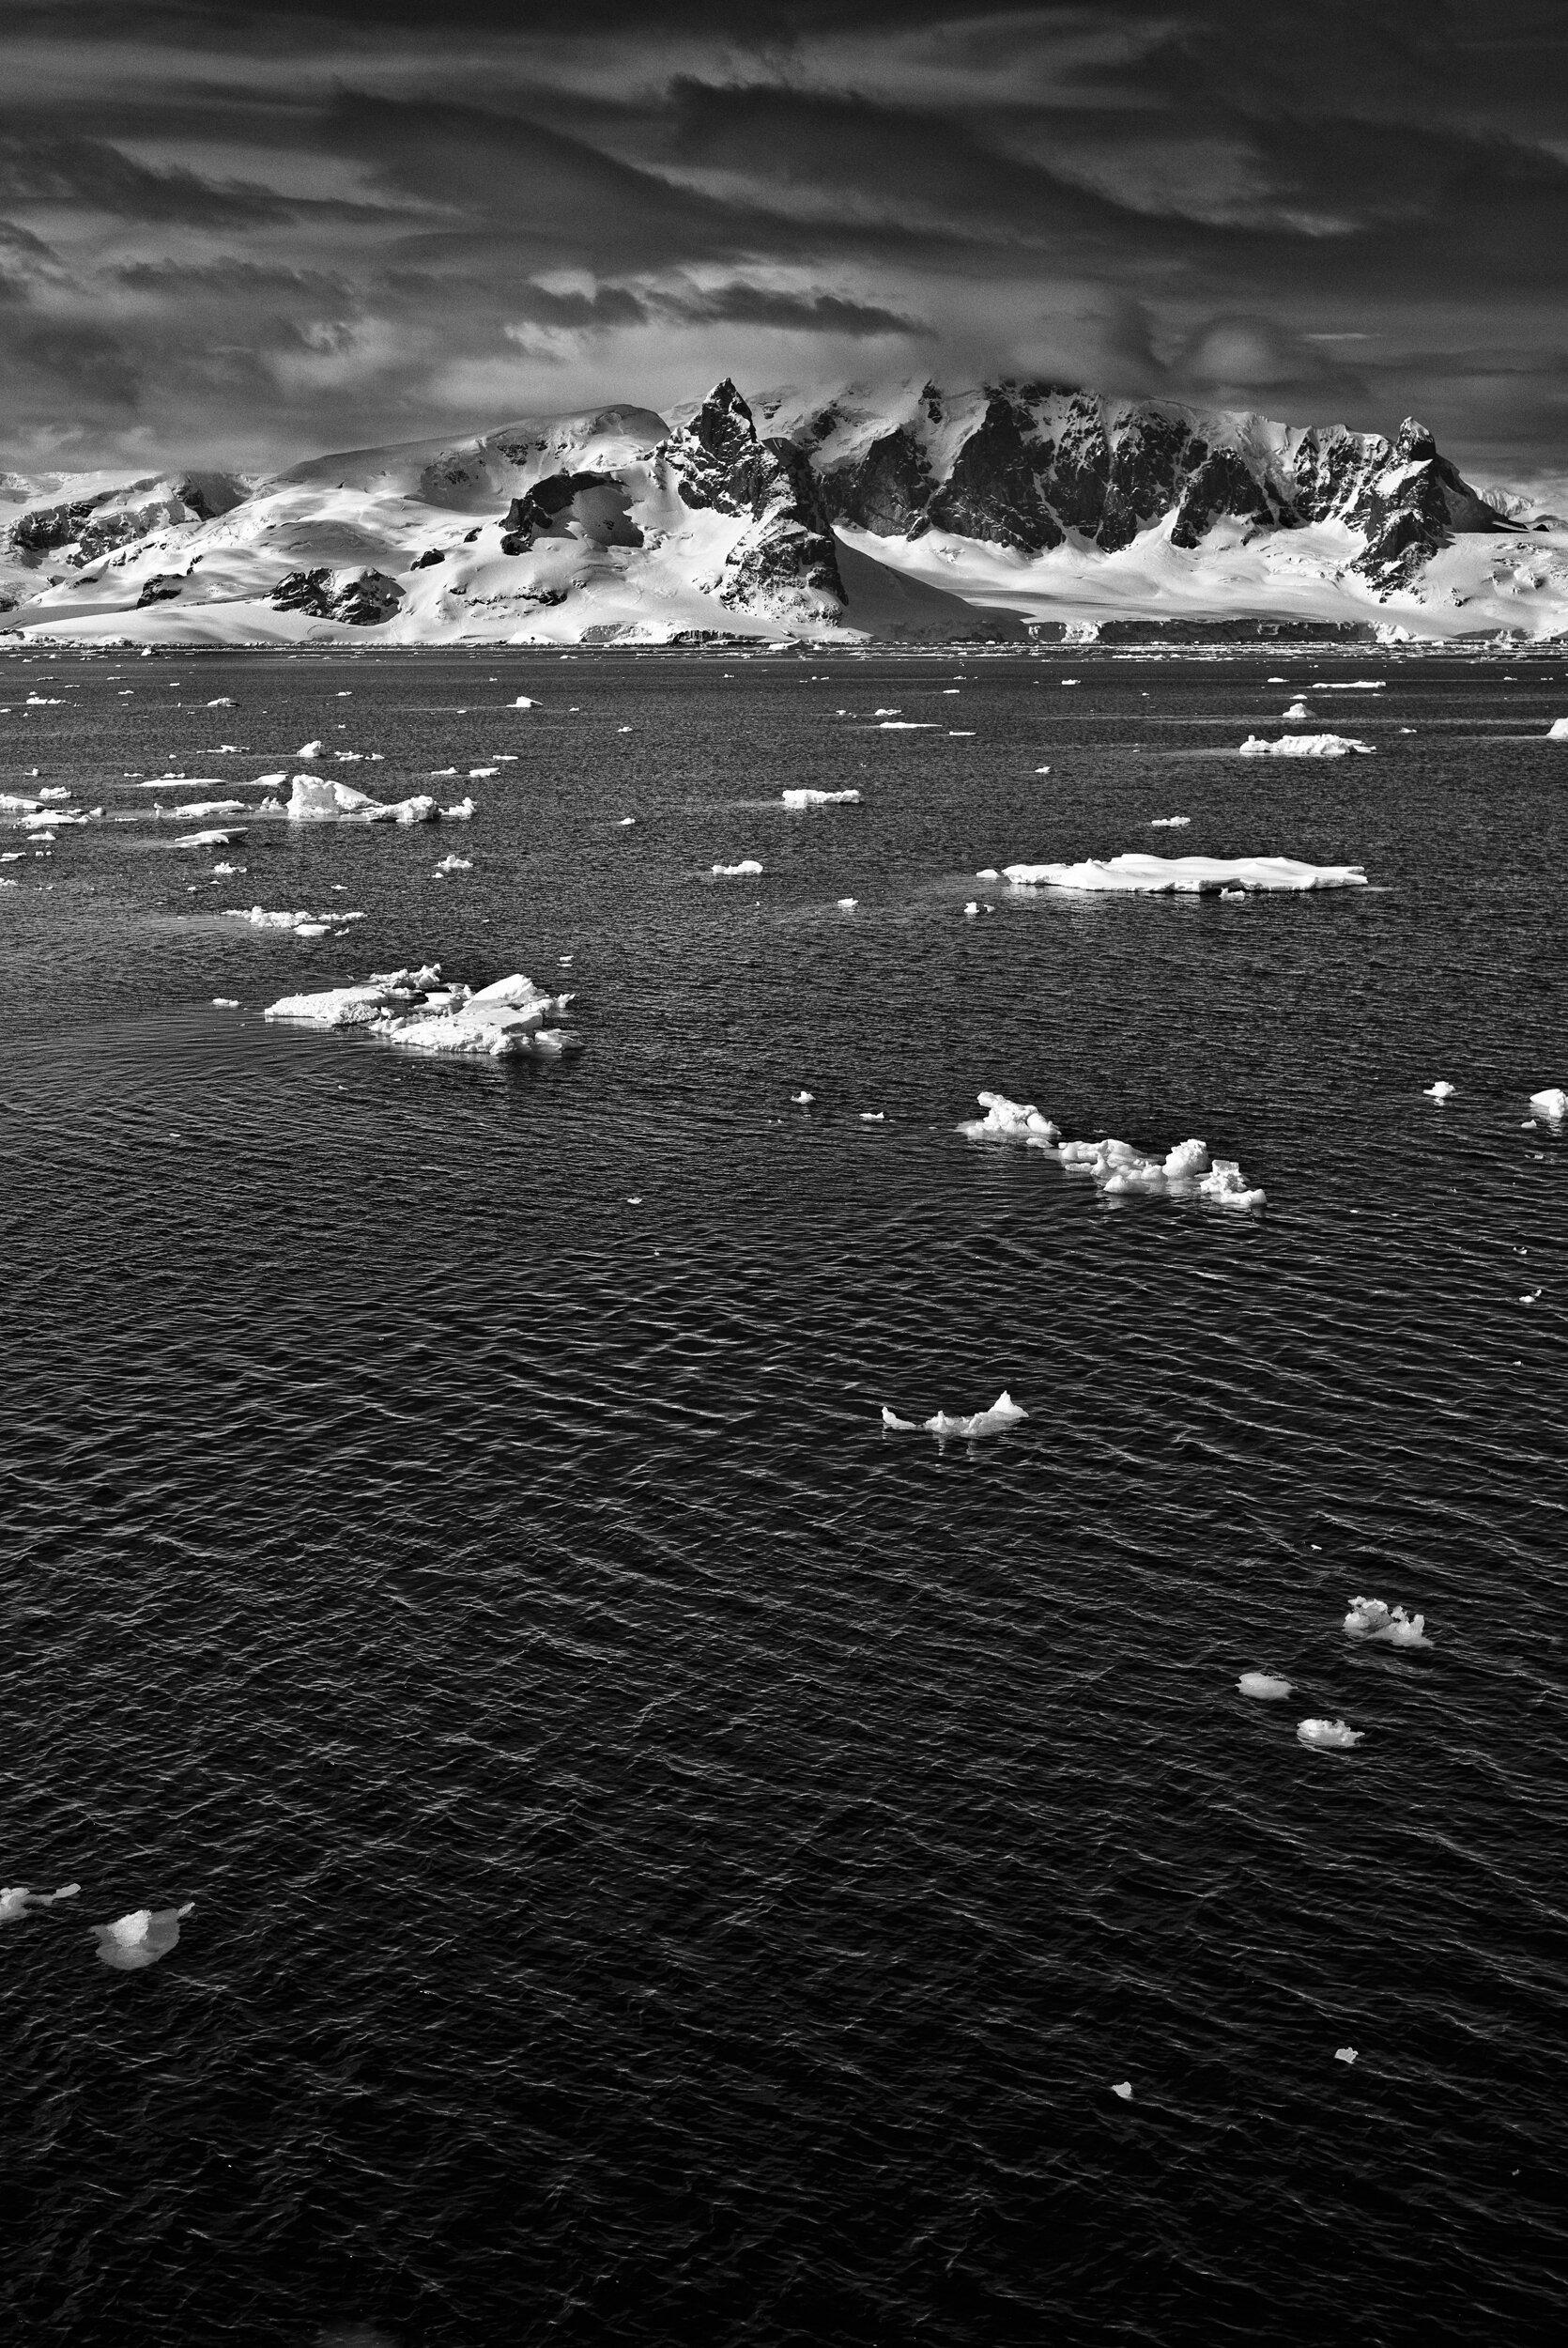 manuel_uebler_antarctica_bw_003.jpg